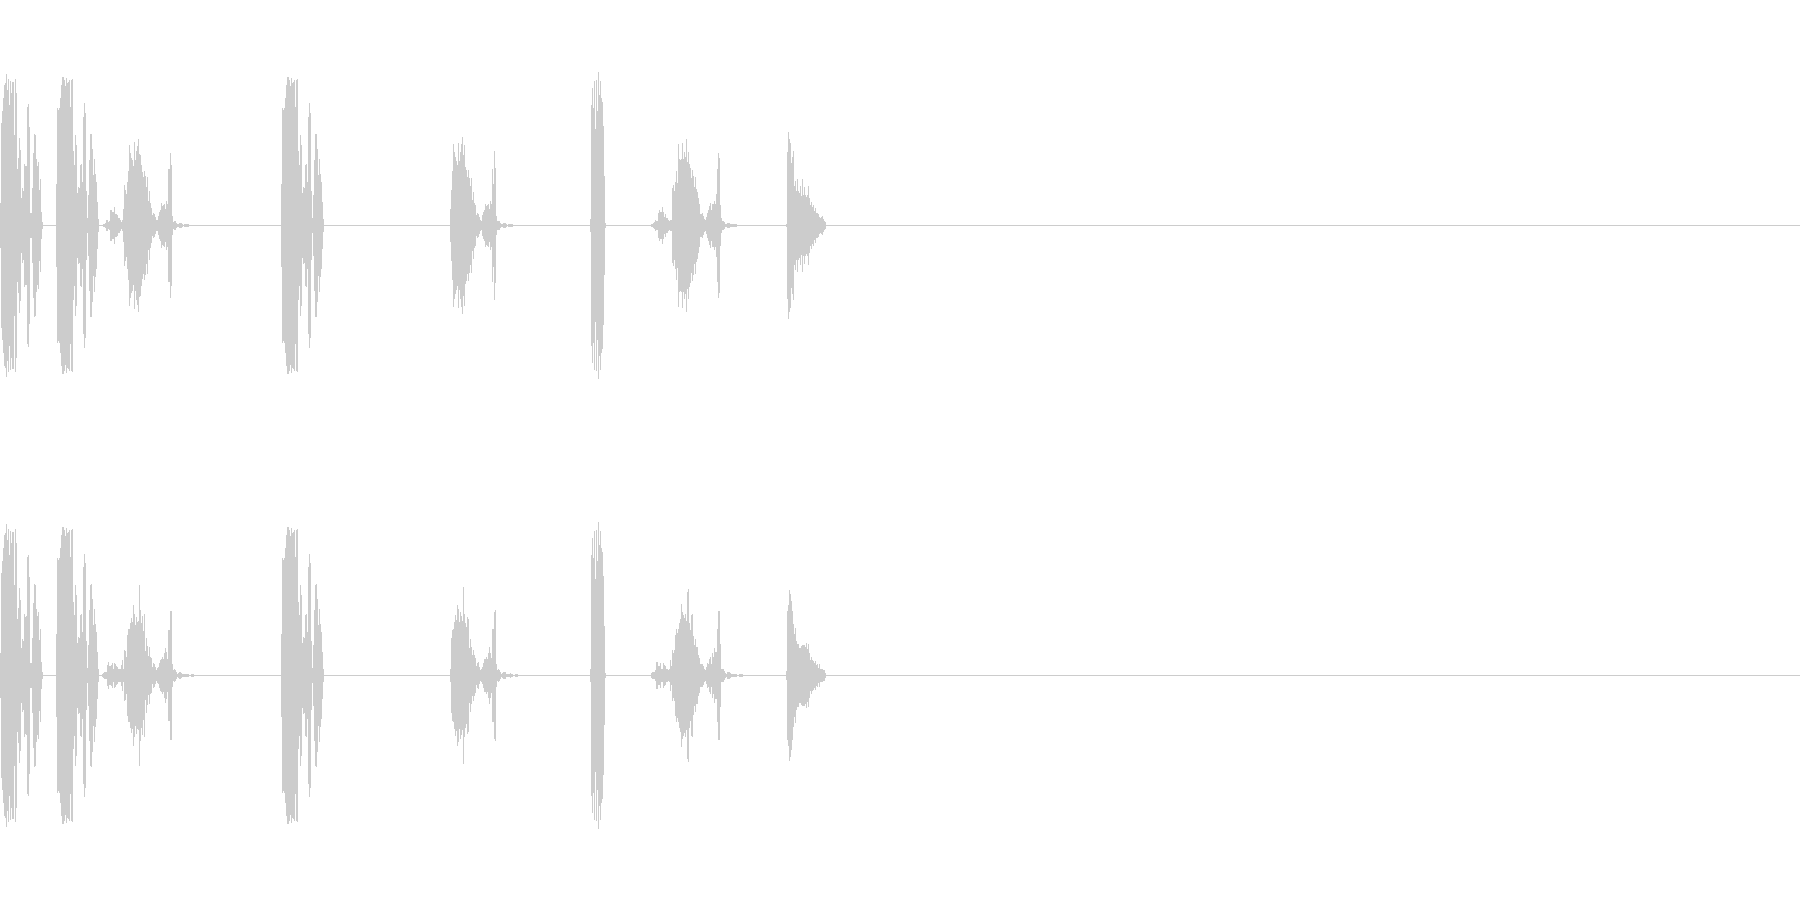 DJスクラッチ/ターンテーブル/E-08の未再生の波形